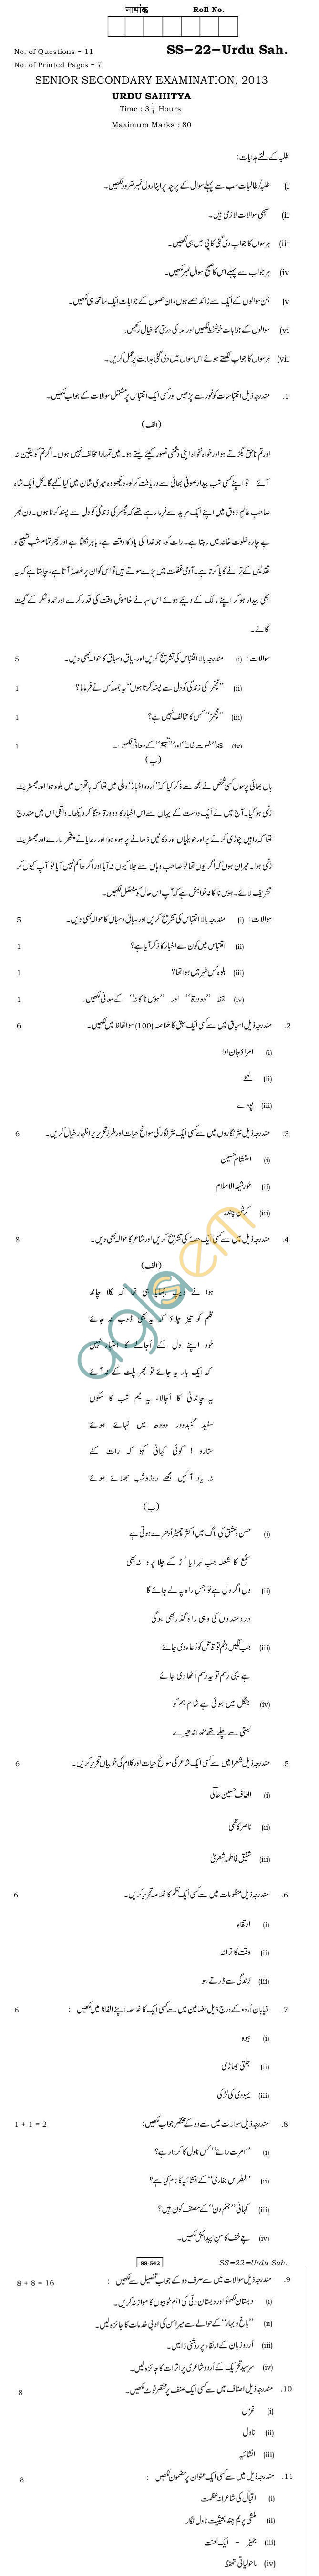 Rajasthan Board Sr. Secondary Urdu Sahitya Question Paper 2013